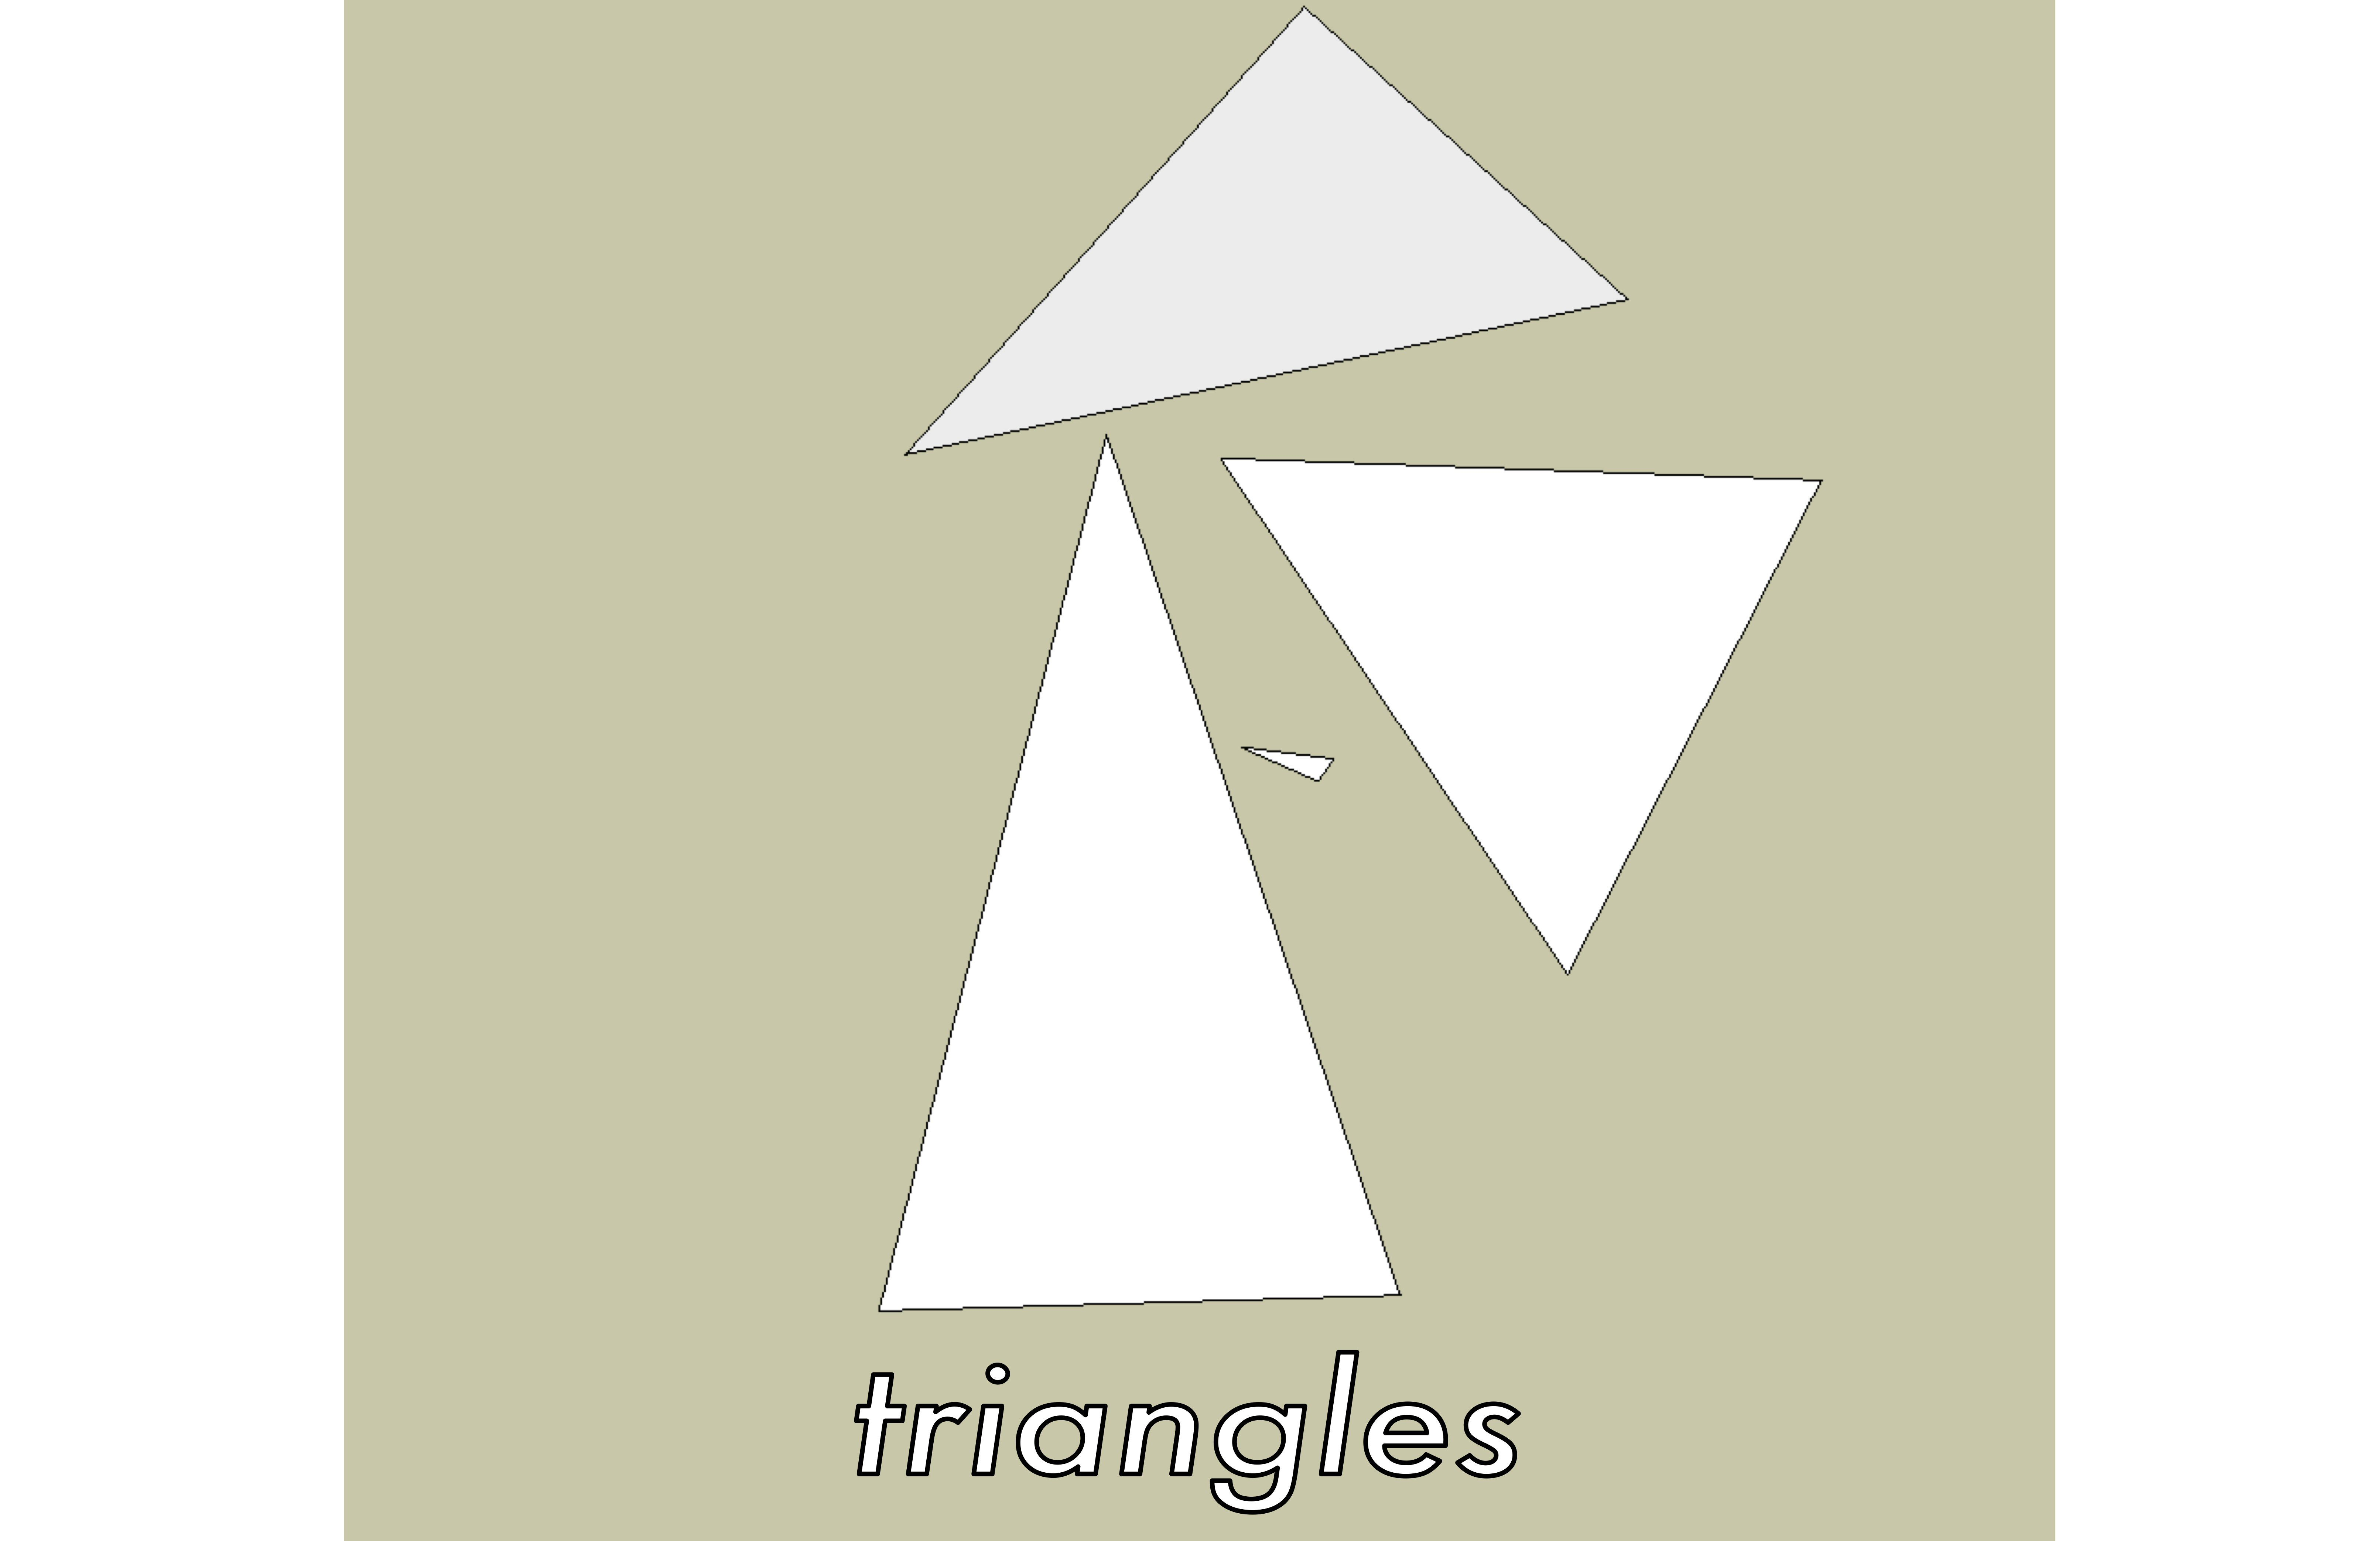 Illustration of triangles.